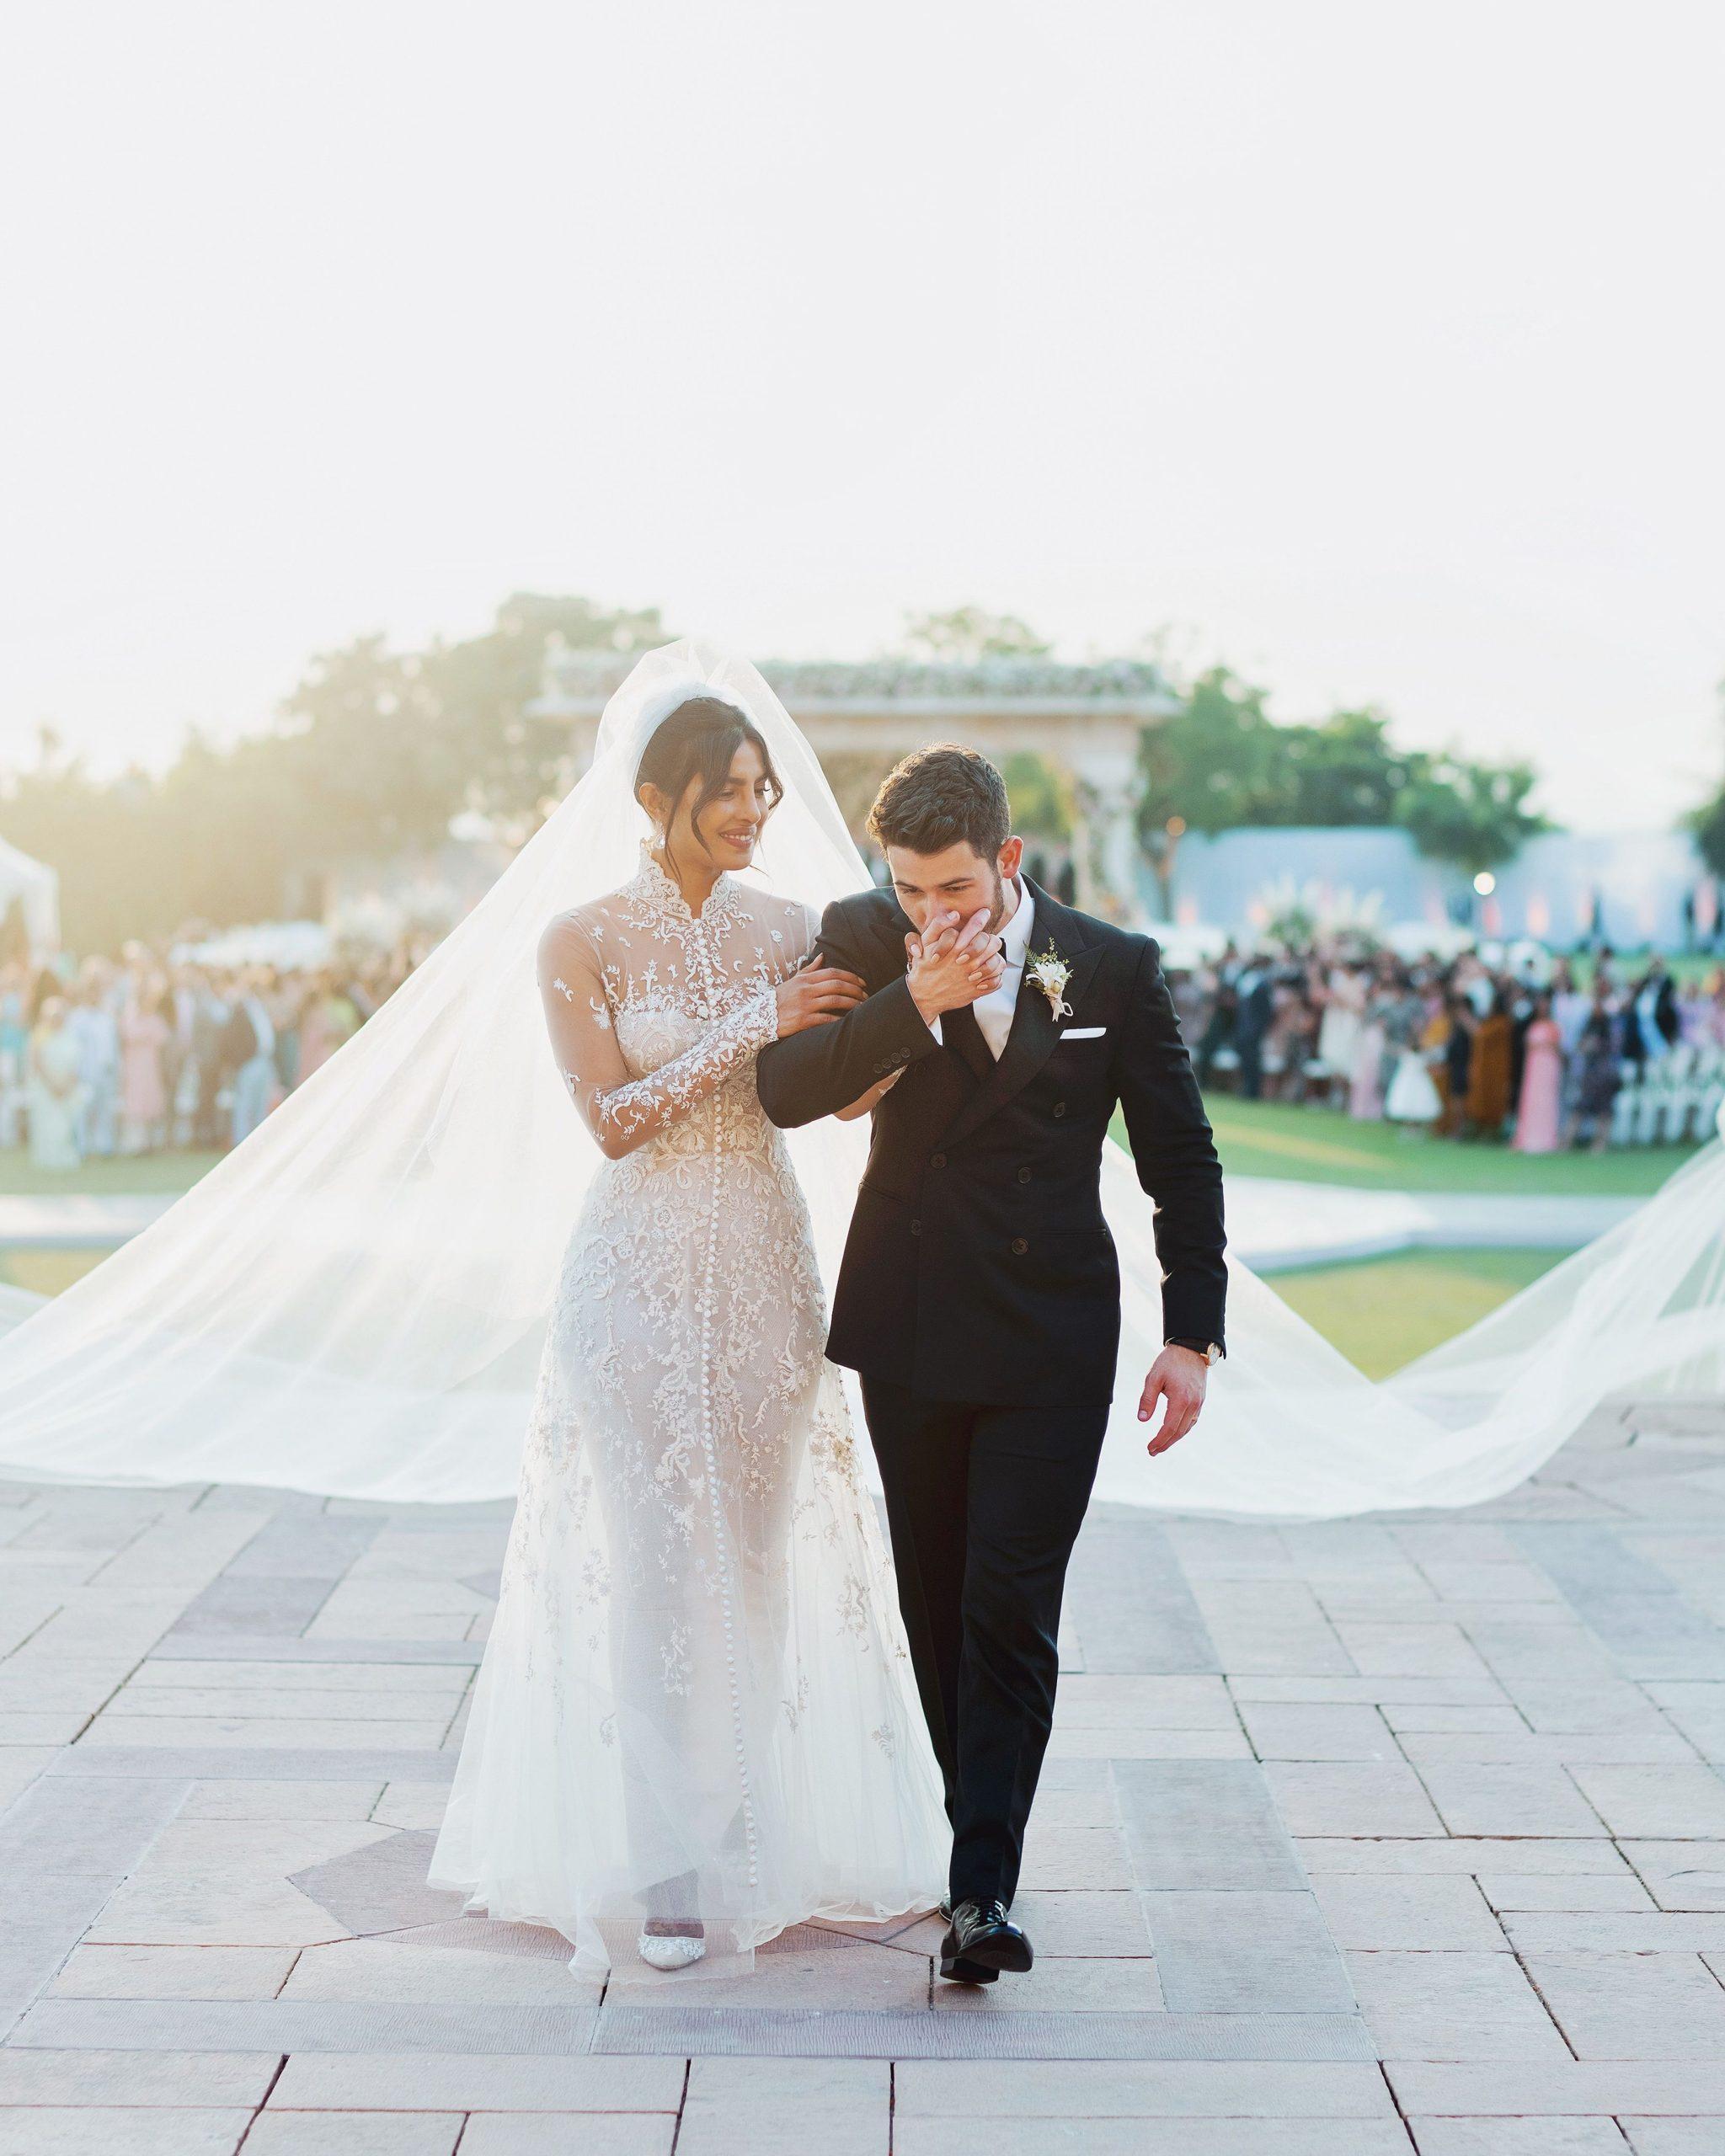 Se mai negociaza o formatie nunta?